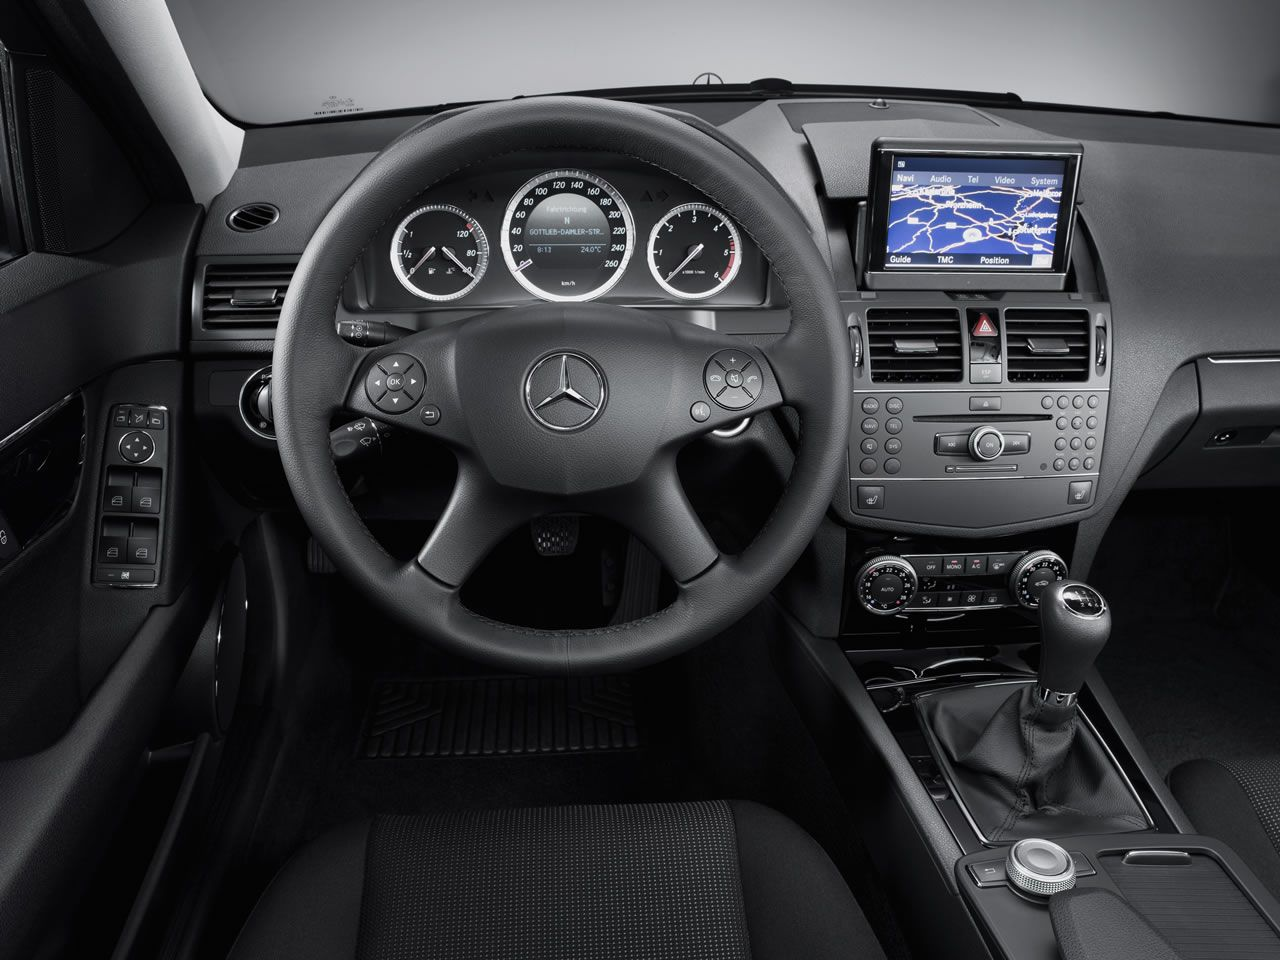 Mercedes Benz C Class C280 Luxury Benz C Mercedes Benz